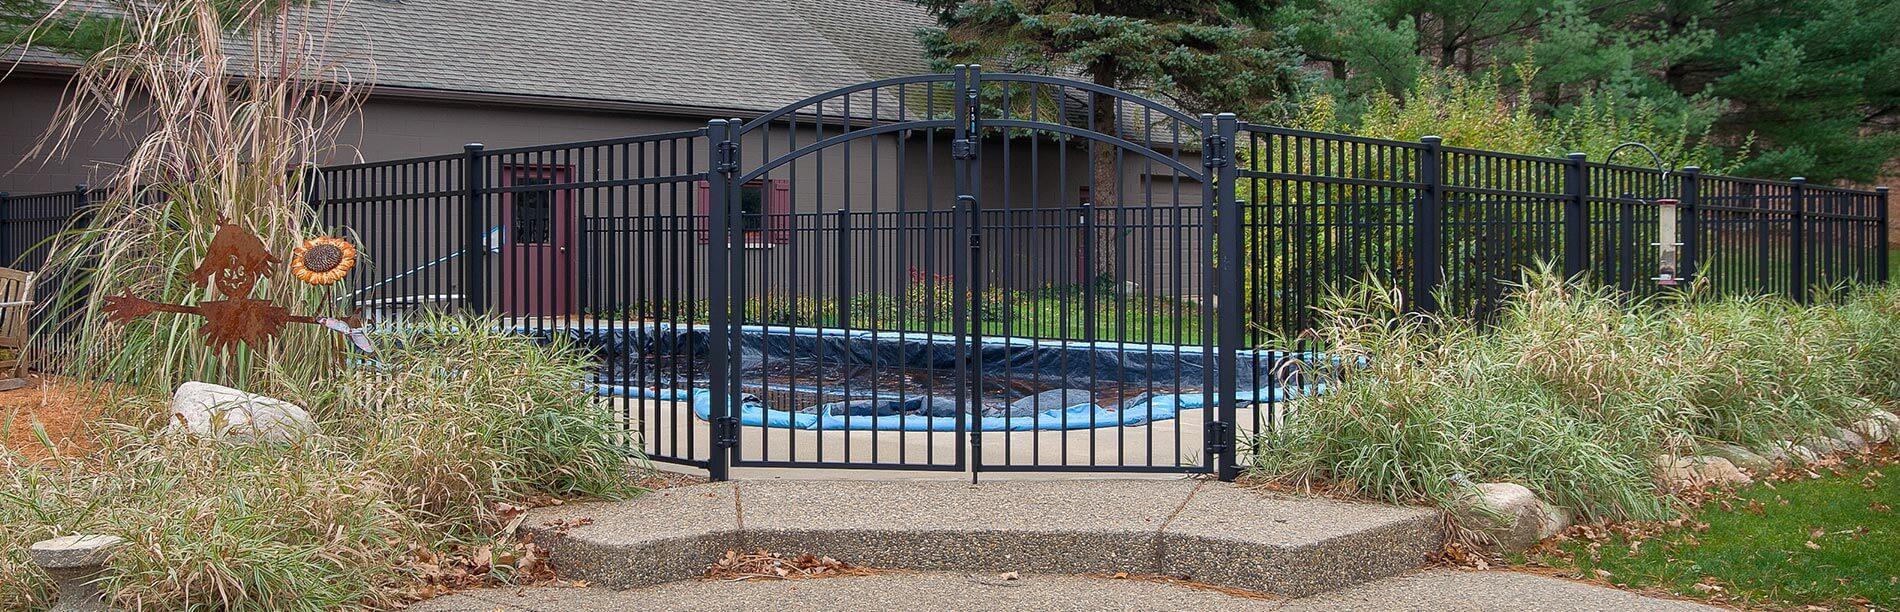 Kalamazoo Residential Ornamental Aluminum Fence Gates